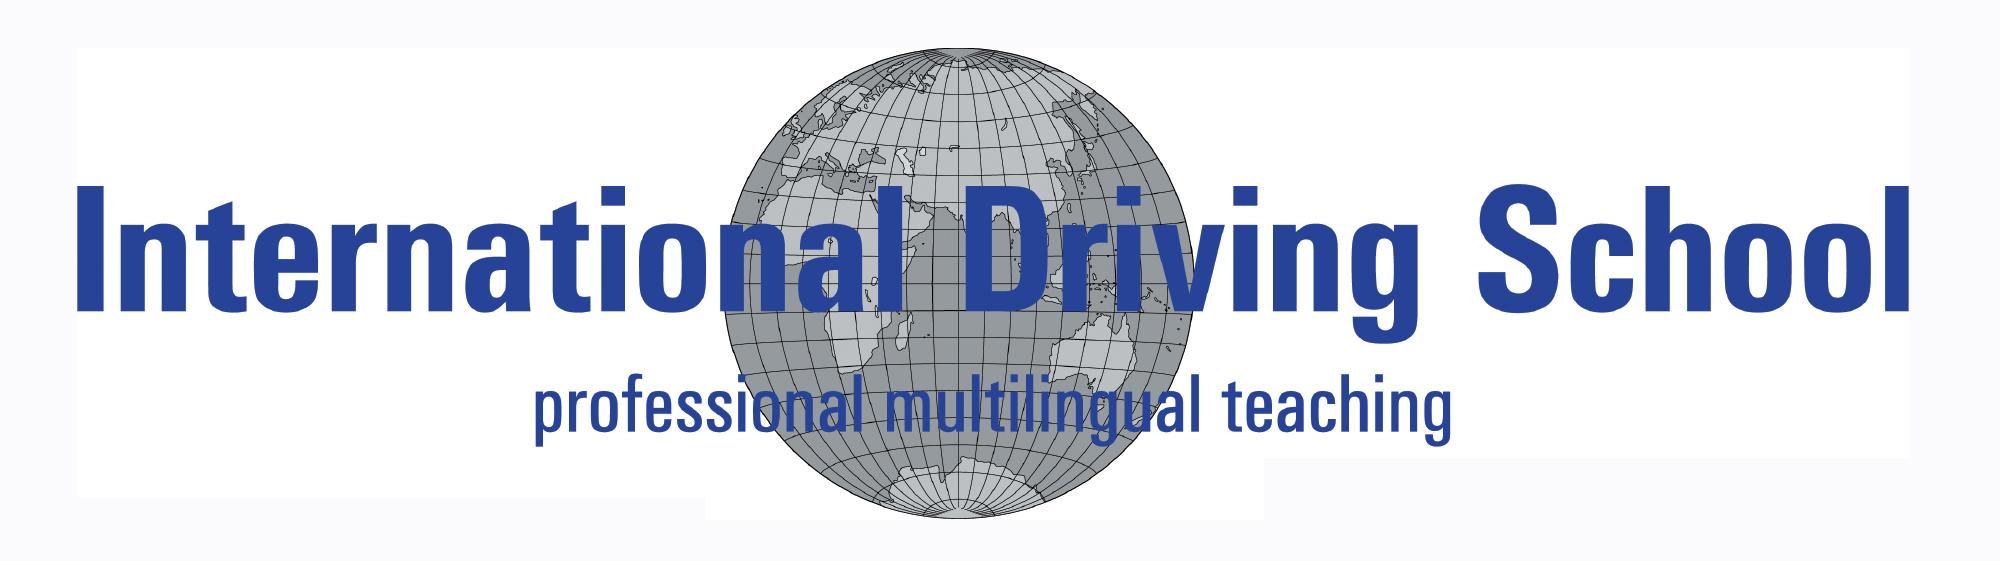 Imternational Driving School